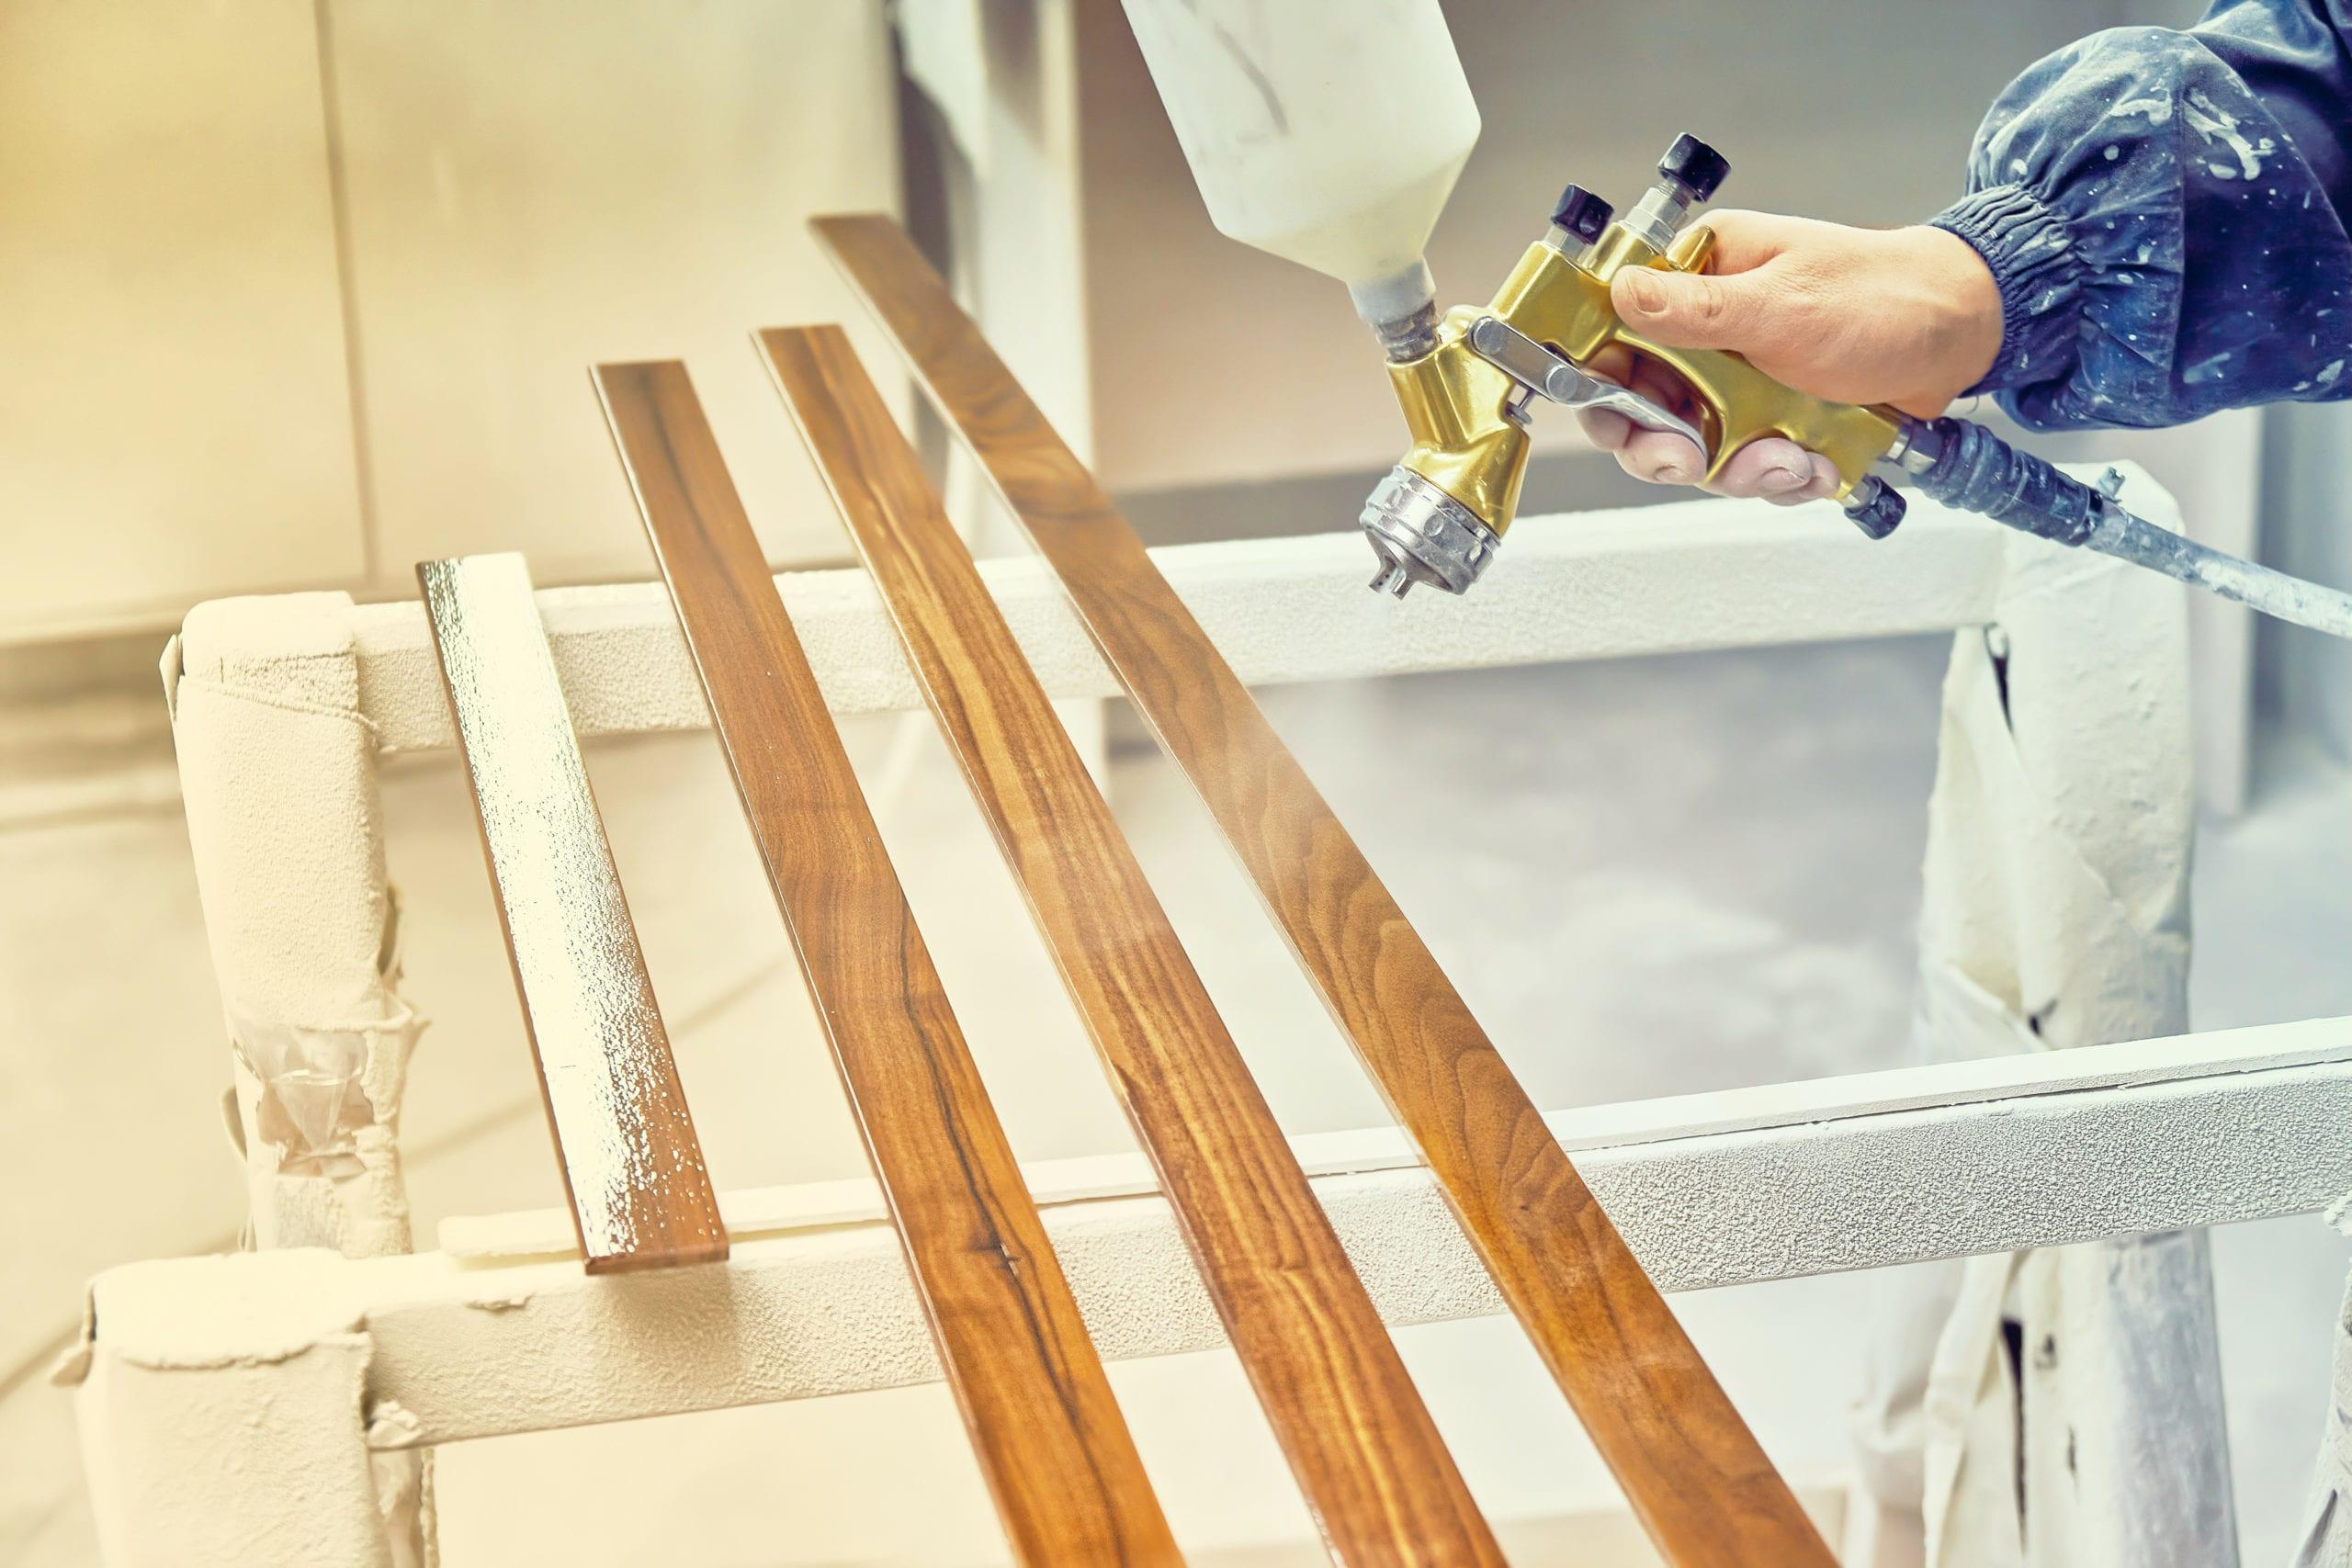 Man Painting Furniture Details In A Spray Booth. Worker Using Spray Gun.